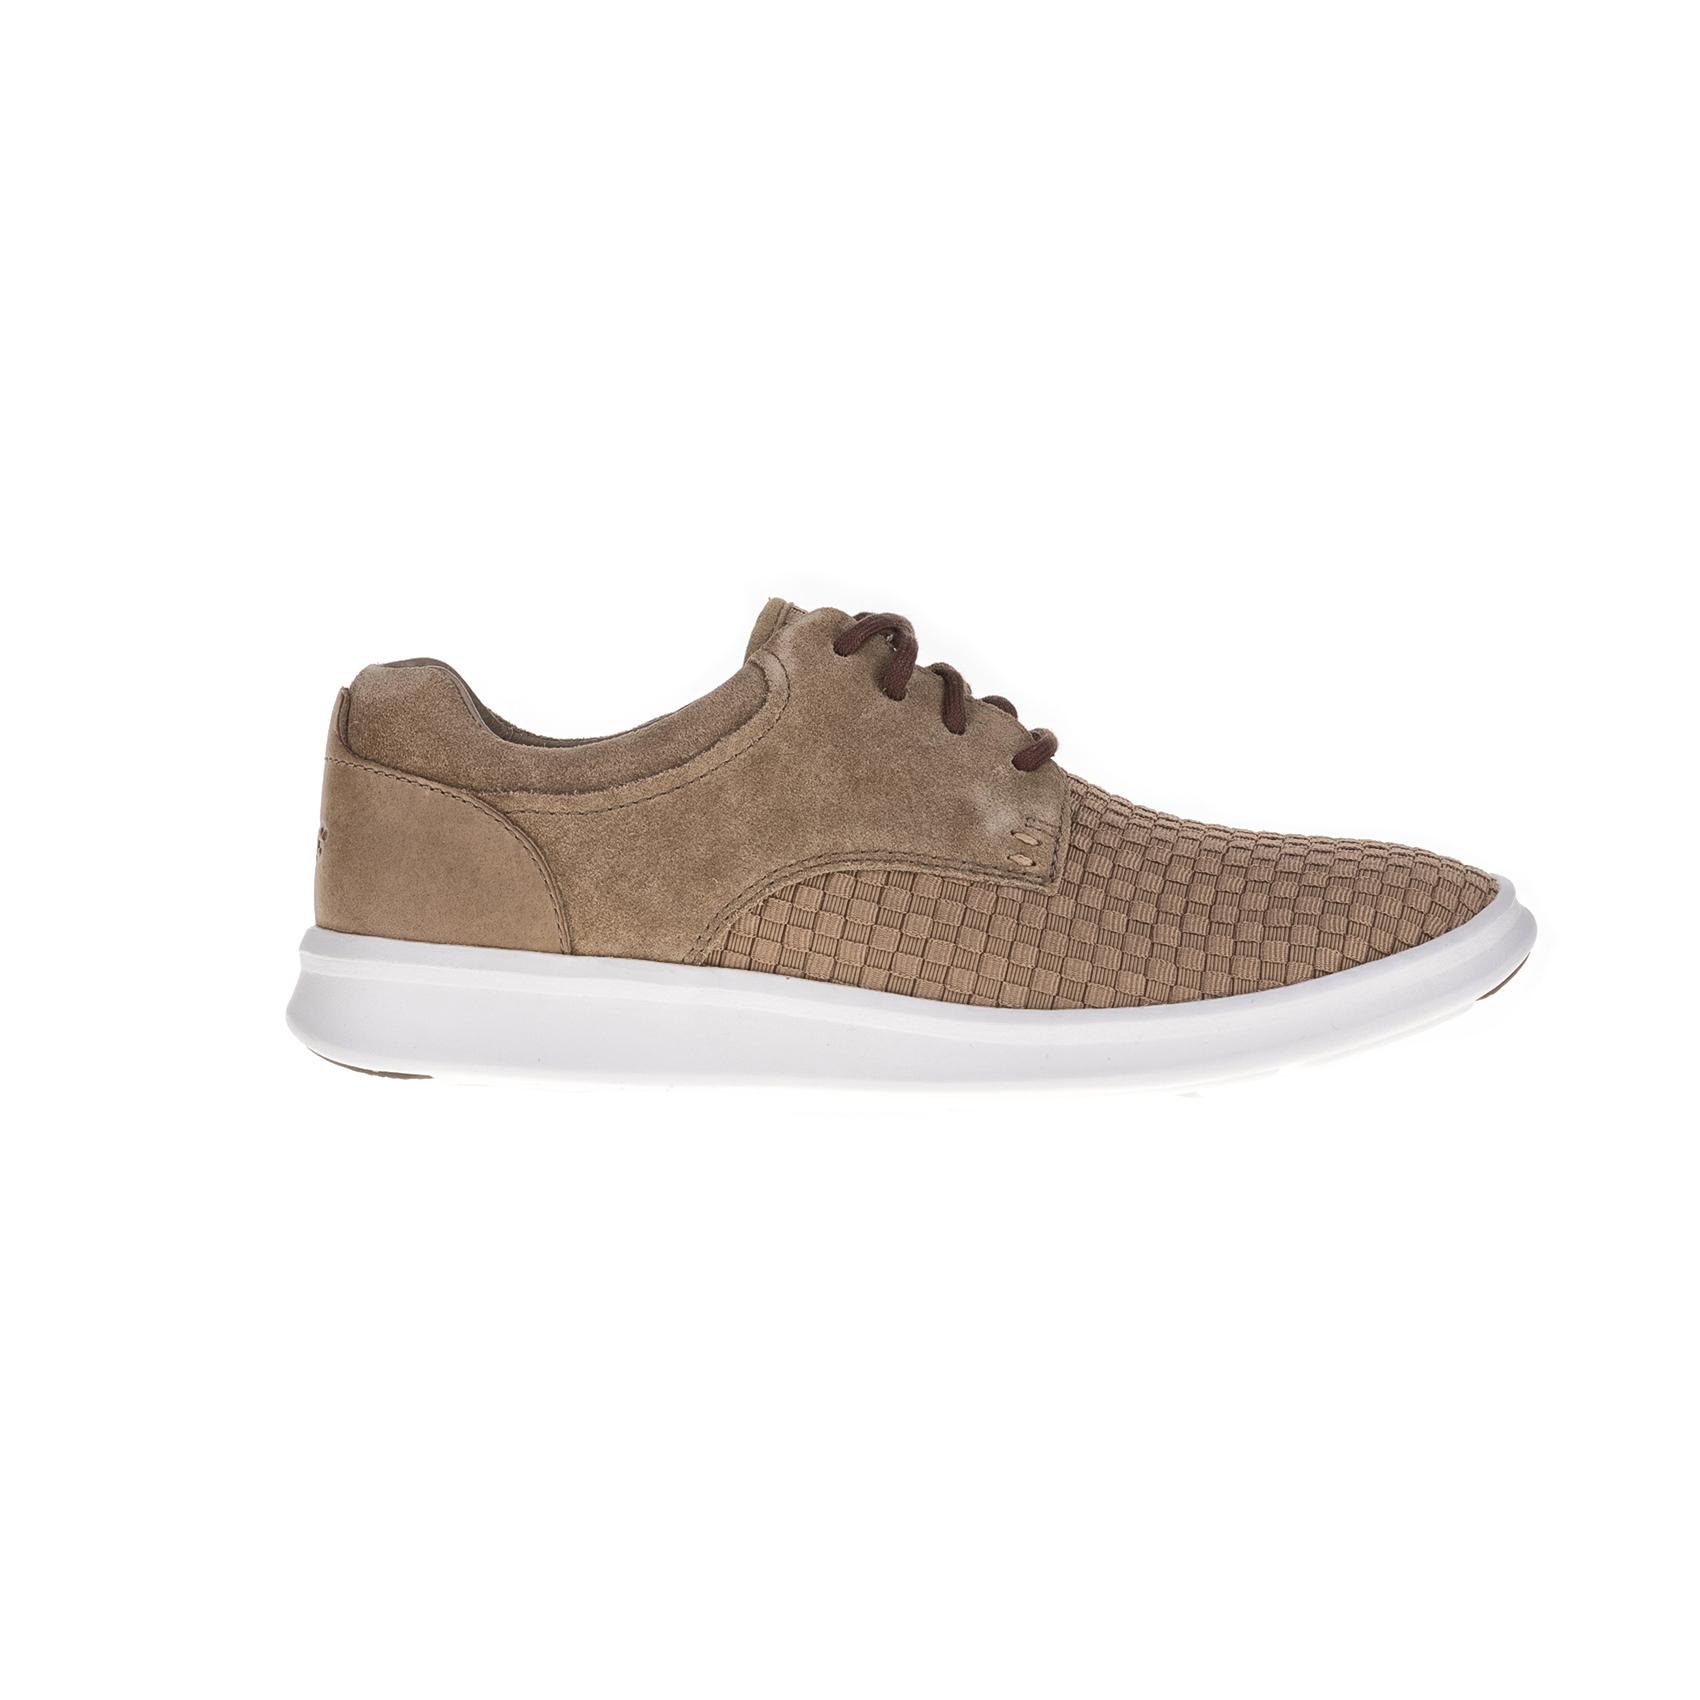 UGG – Ανδρικά δετά παπούτσια UGG Hepner μπεζ